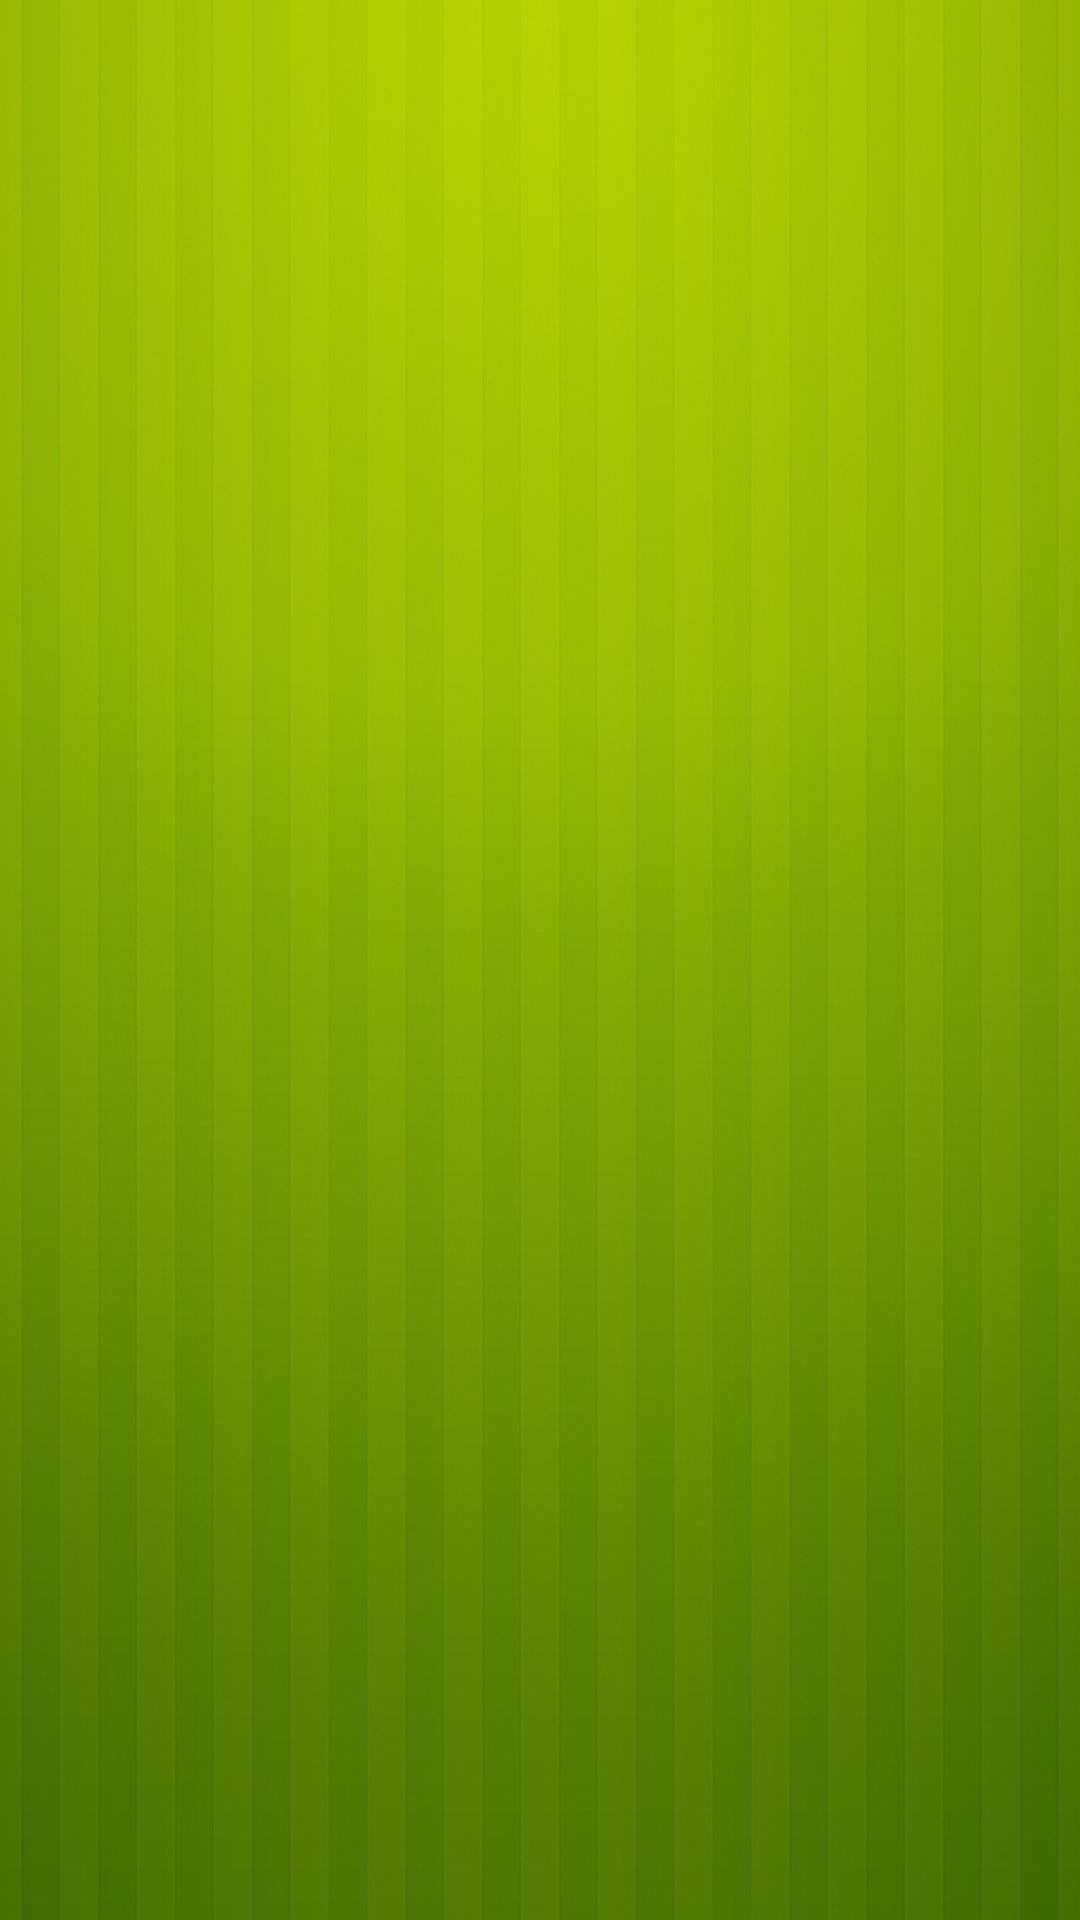 1080x1920 vertical wallpapers